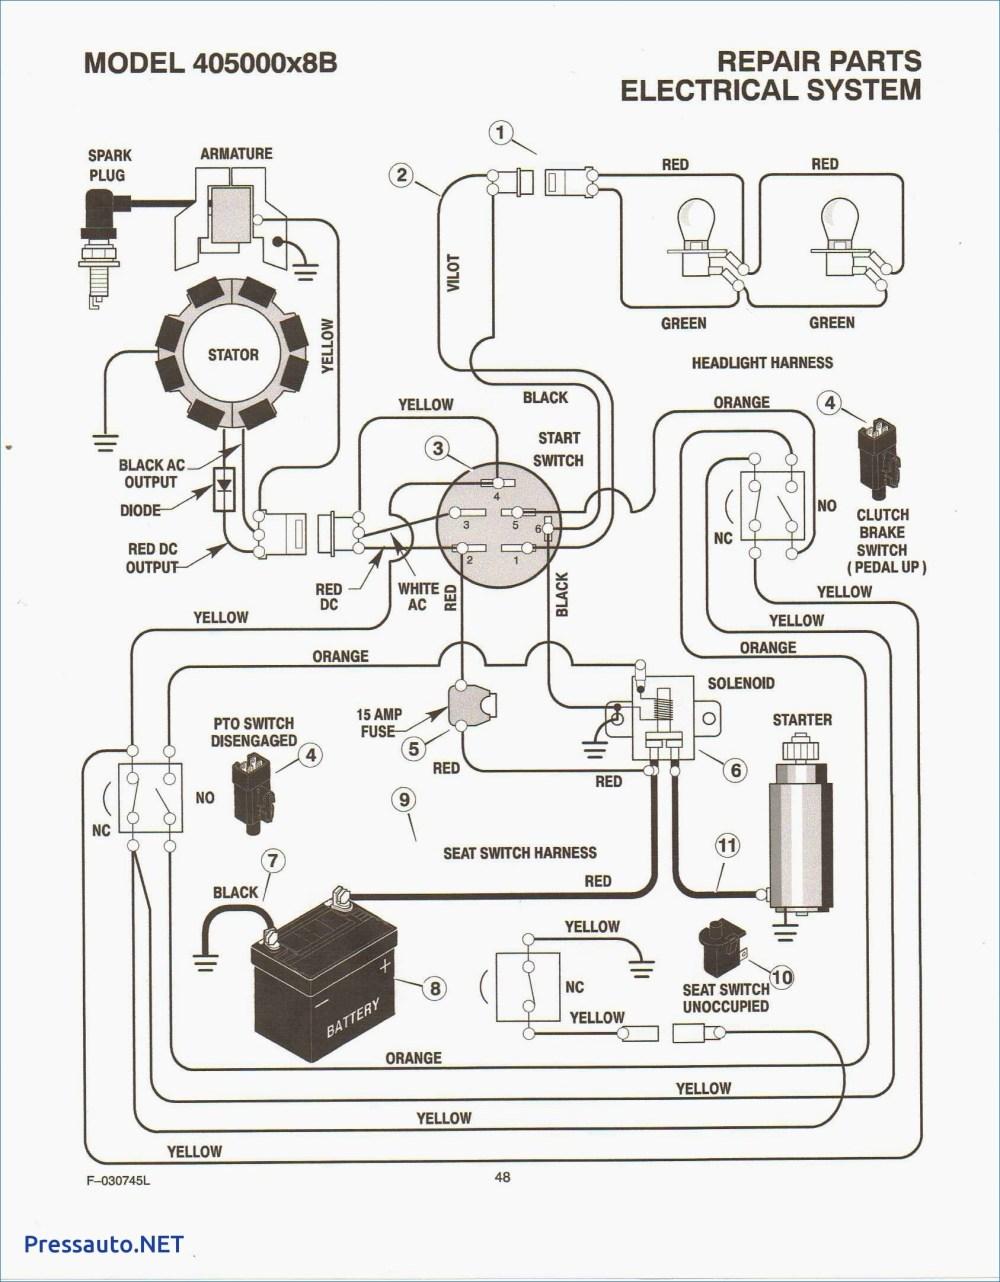 medium resolution of john deere 180 wiring harness wiring diagram log john deere 180 wiring harness john deere 180 wiring harness